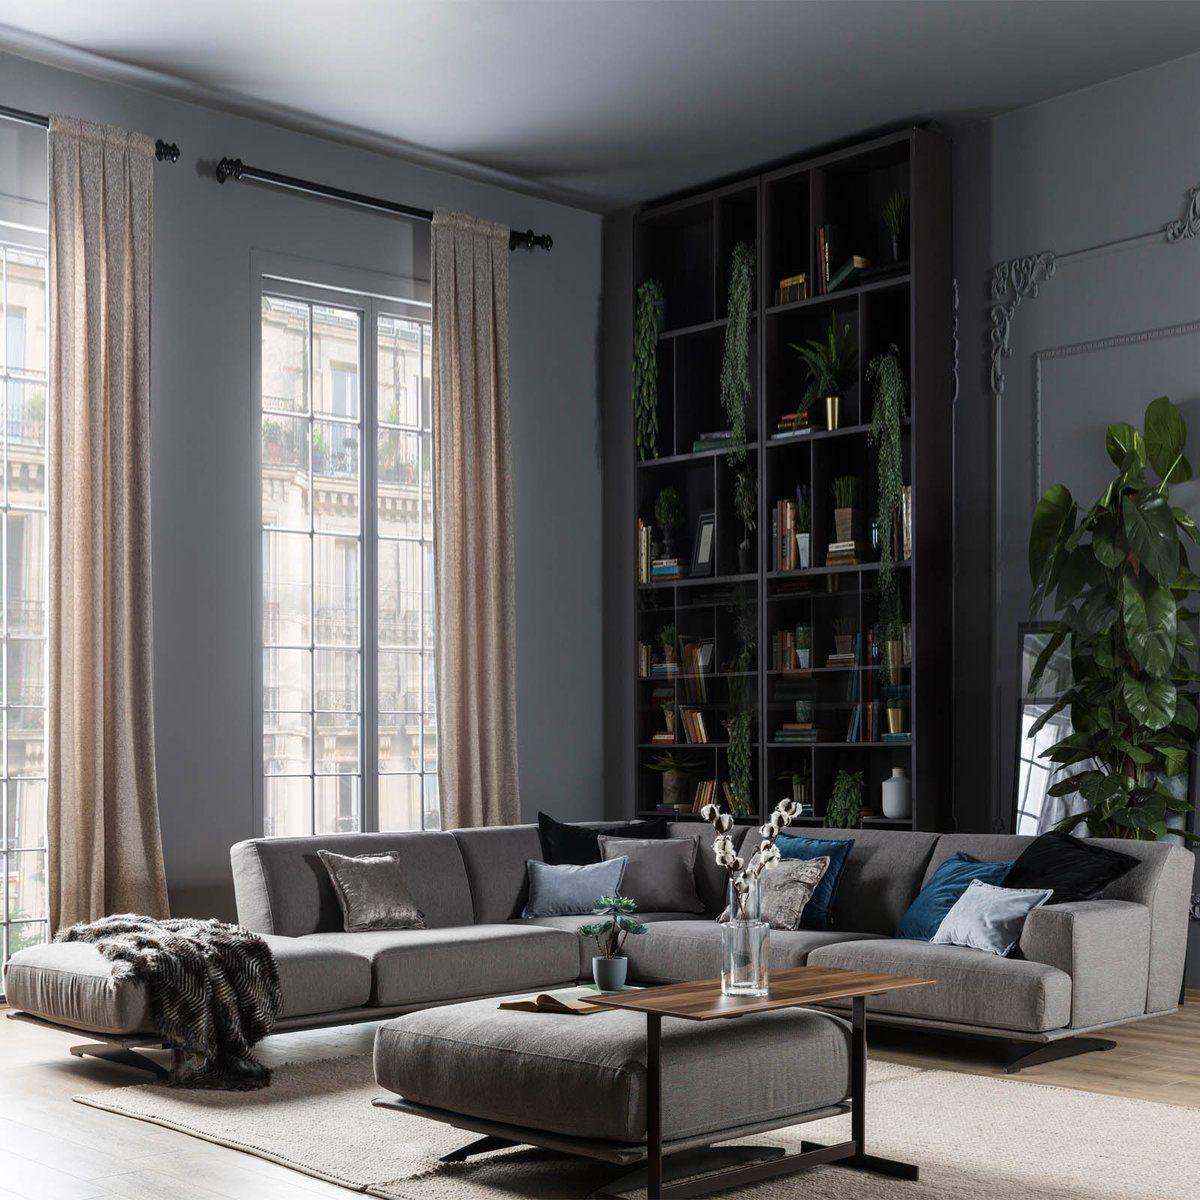 Bolero L Shape Sofa Bol Lx1 Flip Living Room Designs Room Design Bedroom Corner Sofa Set